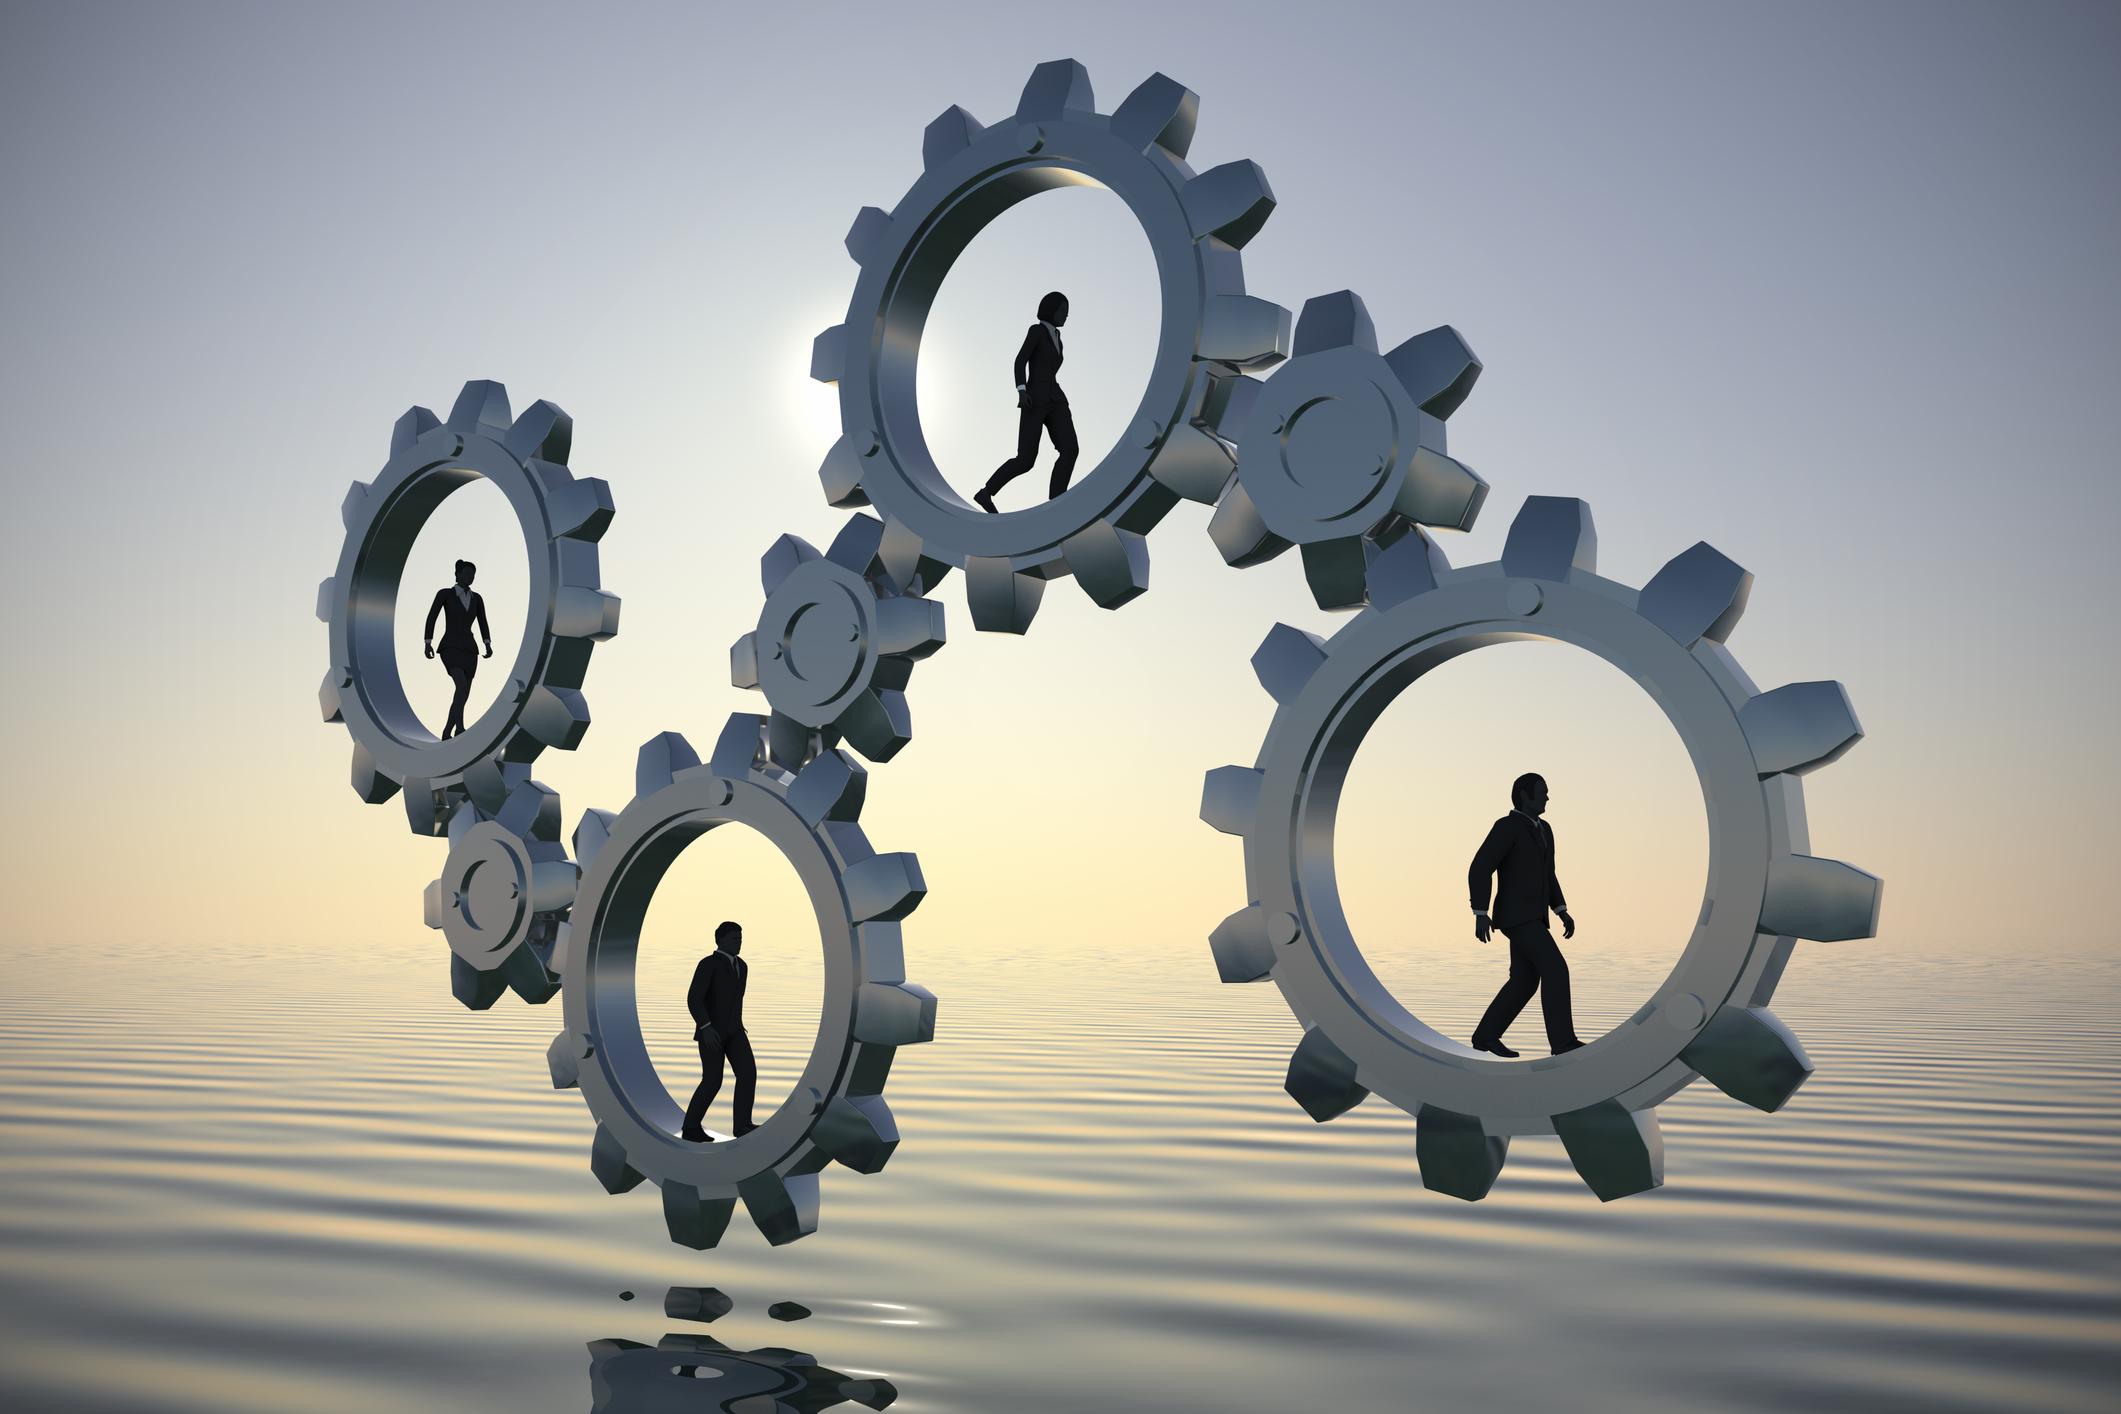 Productivity Factors - RESOURCESDECISION MAKINGALIGNMENTACCOUNTABILITYLEADERSHIPGOALS & STRATEGIESPROACTIVE